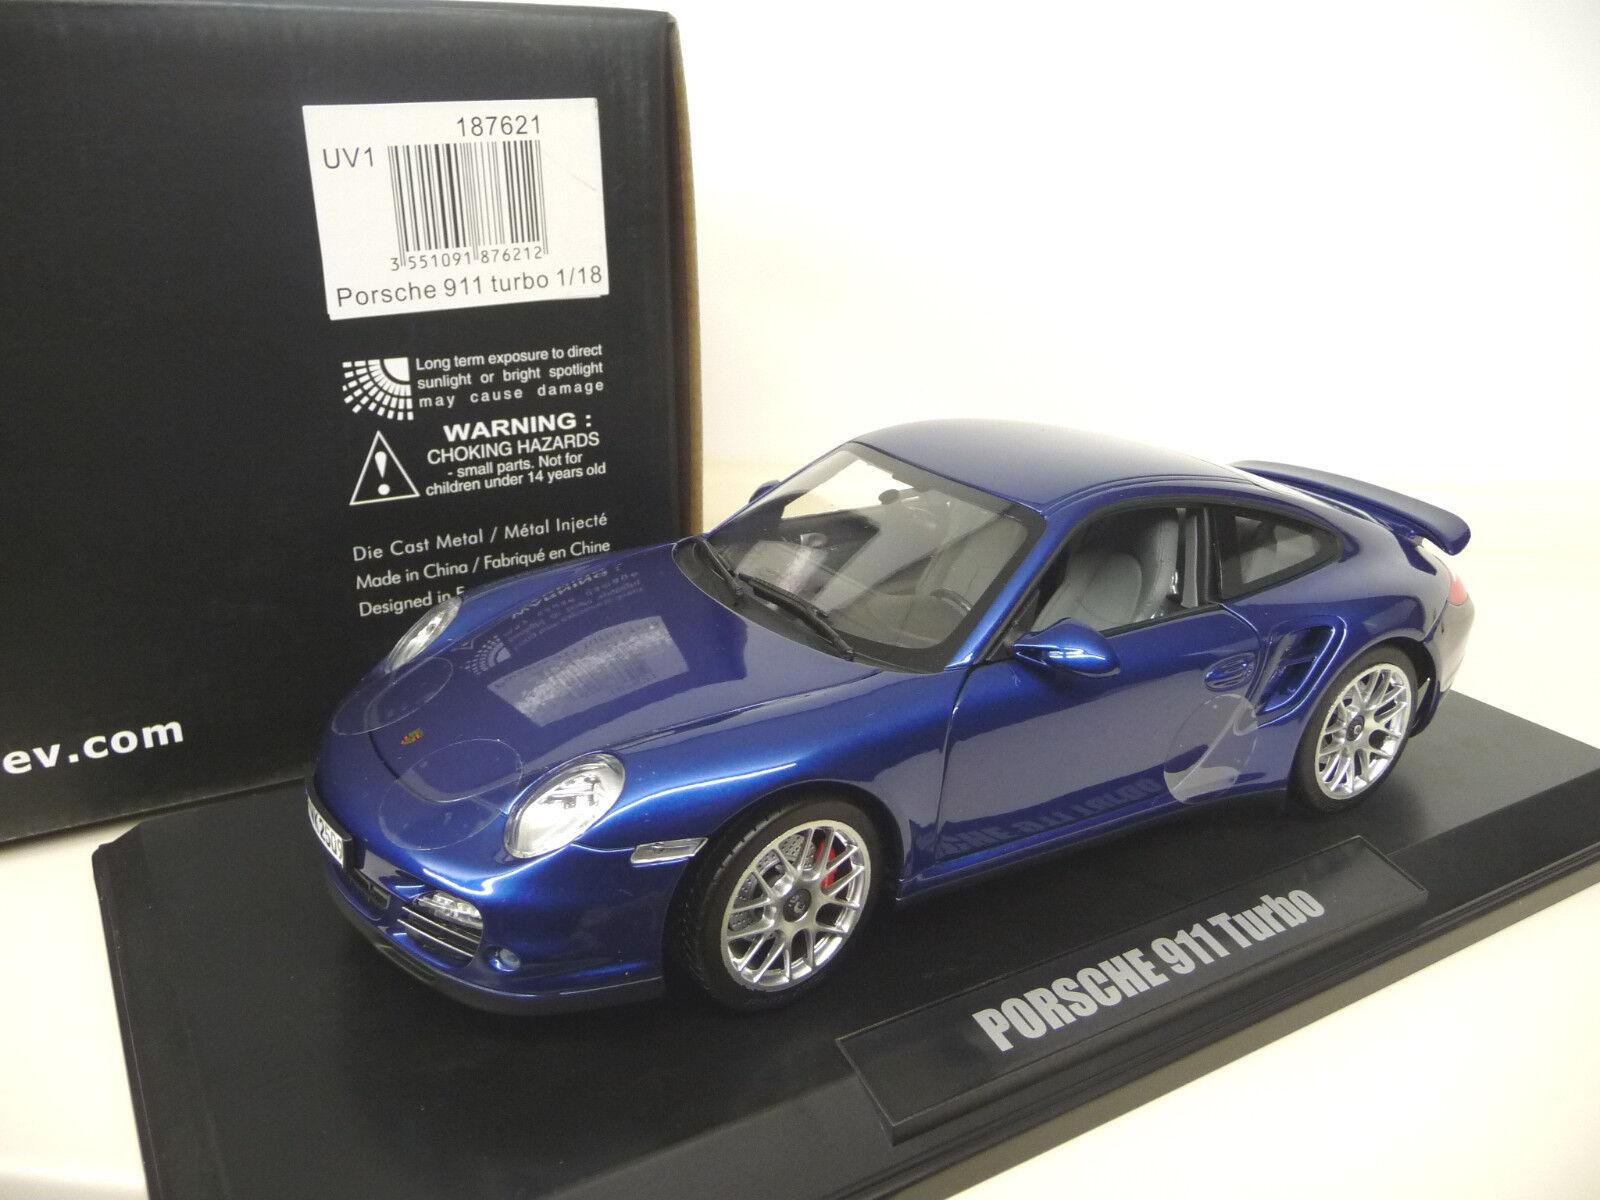 Norev 1 18 Porsche 911 997 turbo aqua bluee  SHIPPING FREE WORLDWIDE